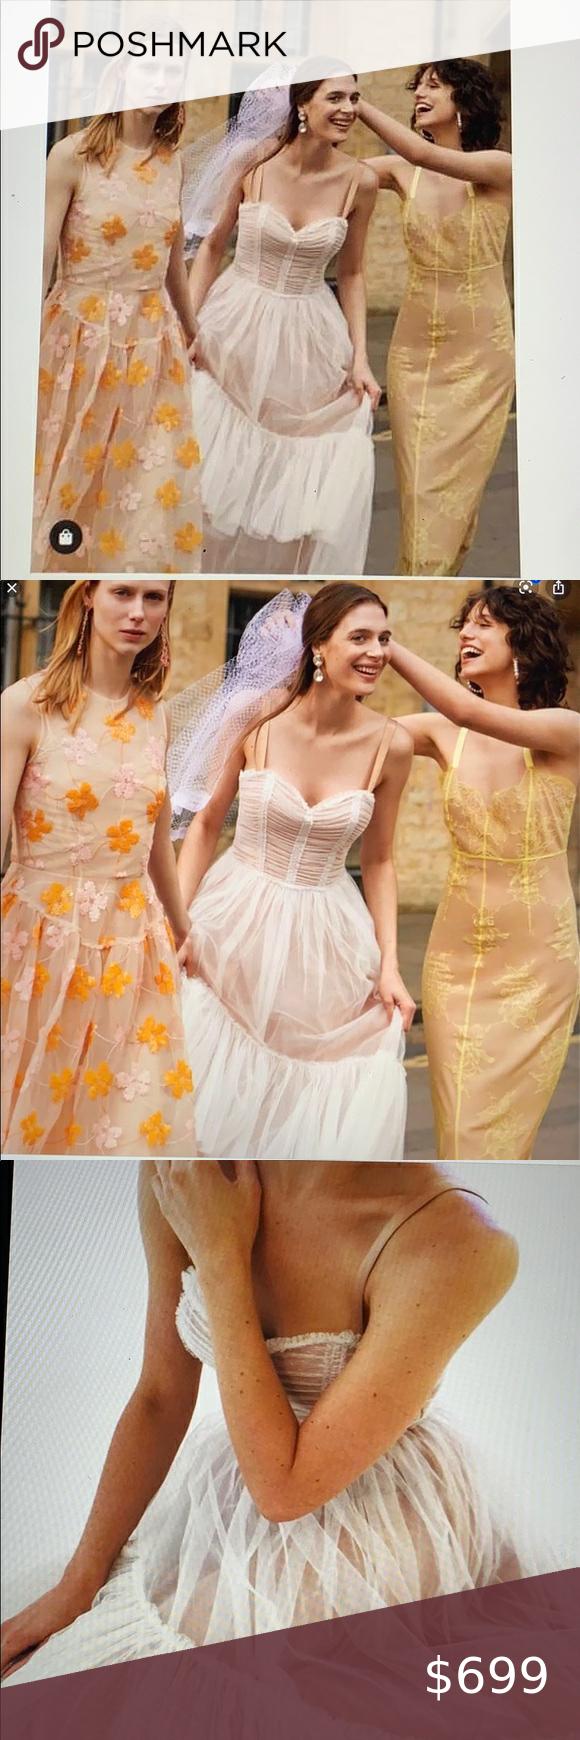 12+ Cinq a sept coletta dress inspirations